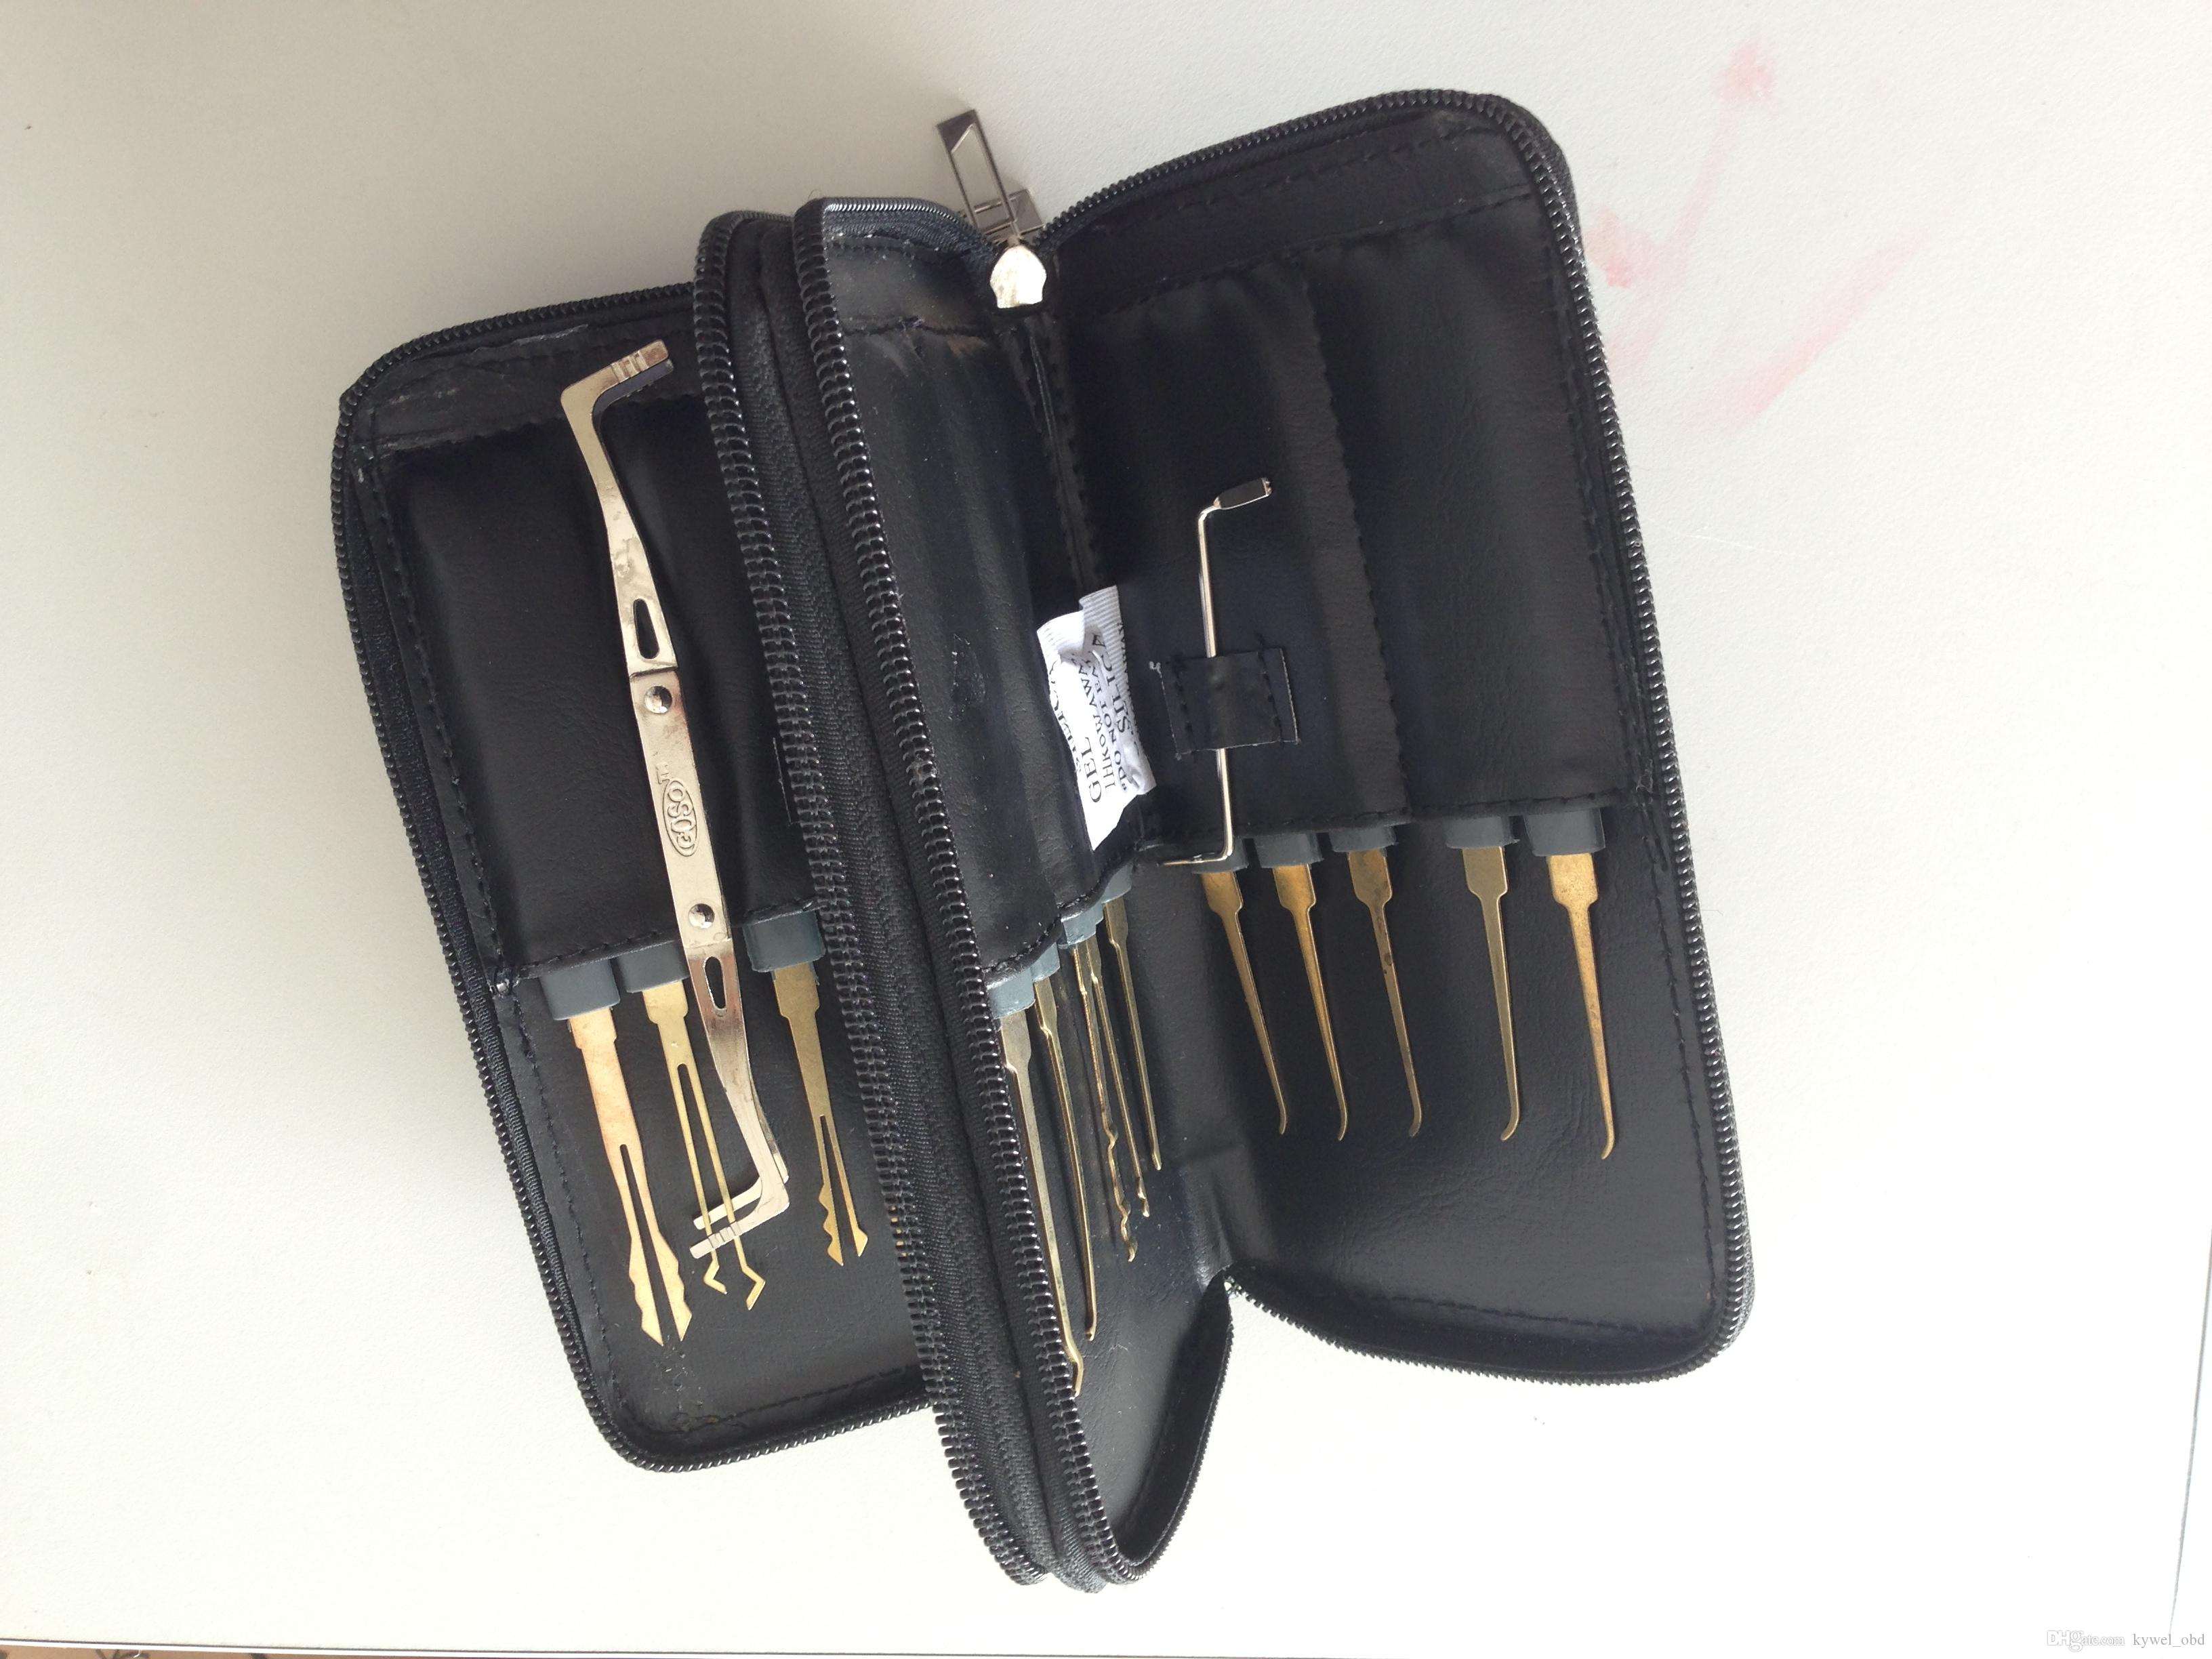 Good Quality GOSO Titanize 20pcs Hook Picks w/ Bag Locksmith Tool Lock Pick Set Lockpick Locksmith tools